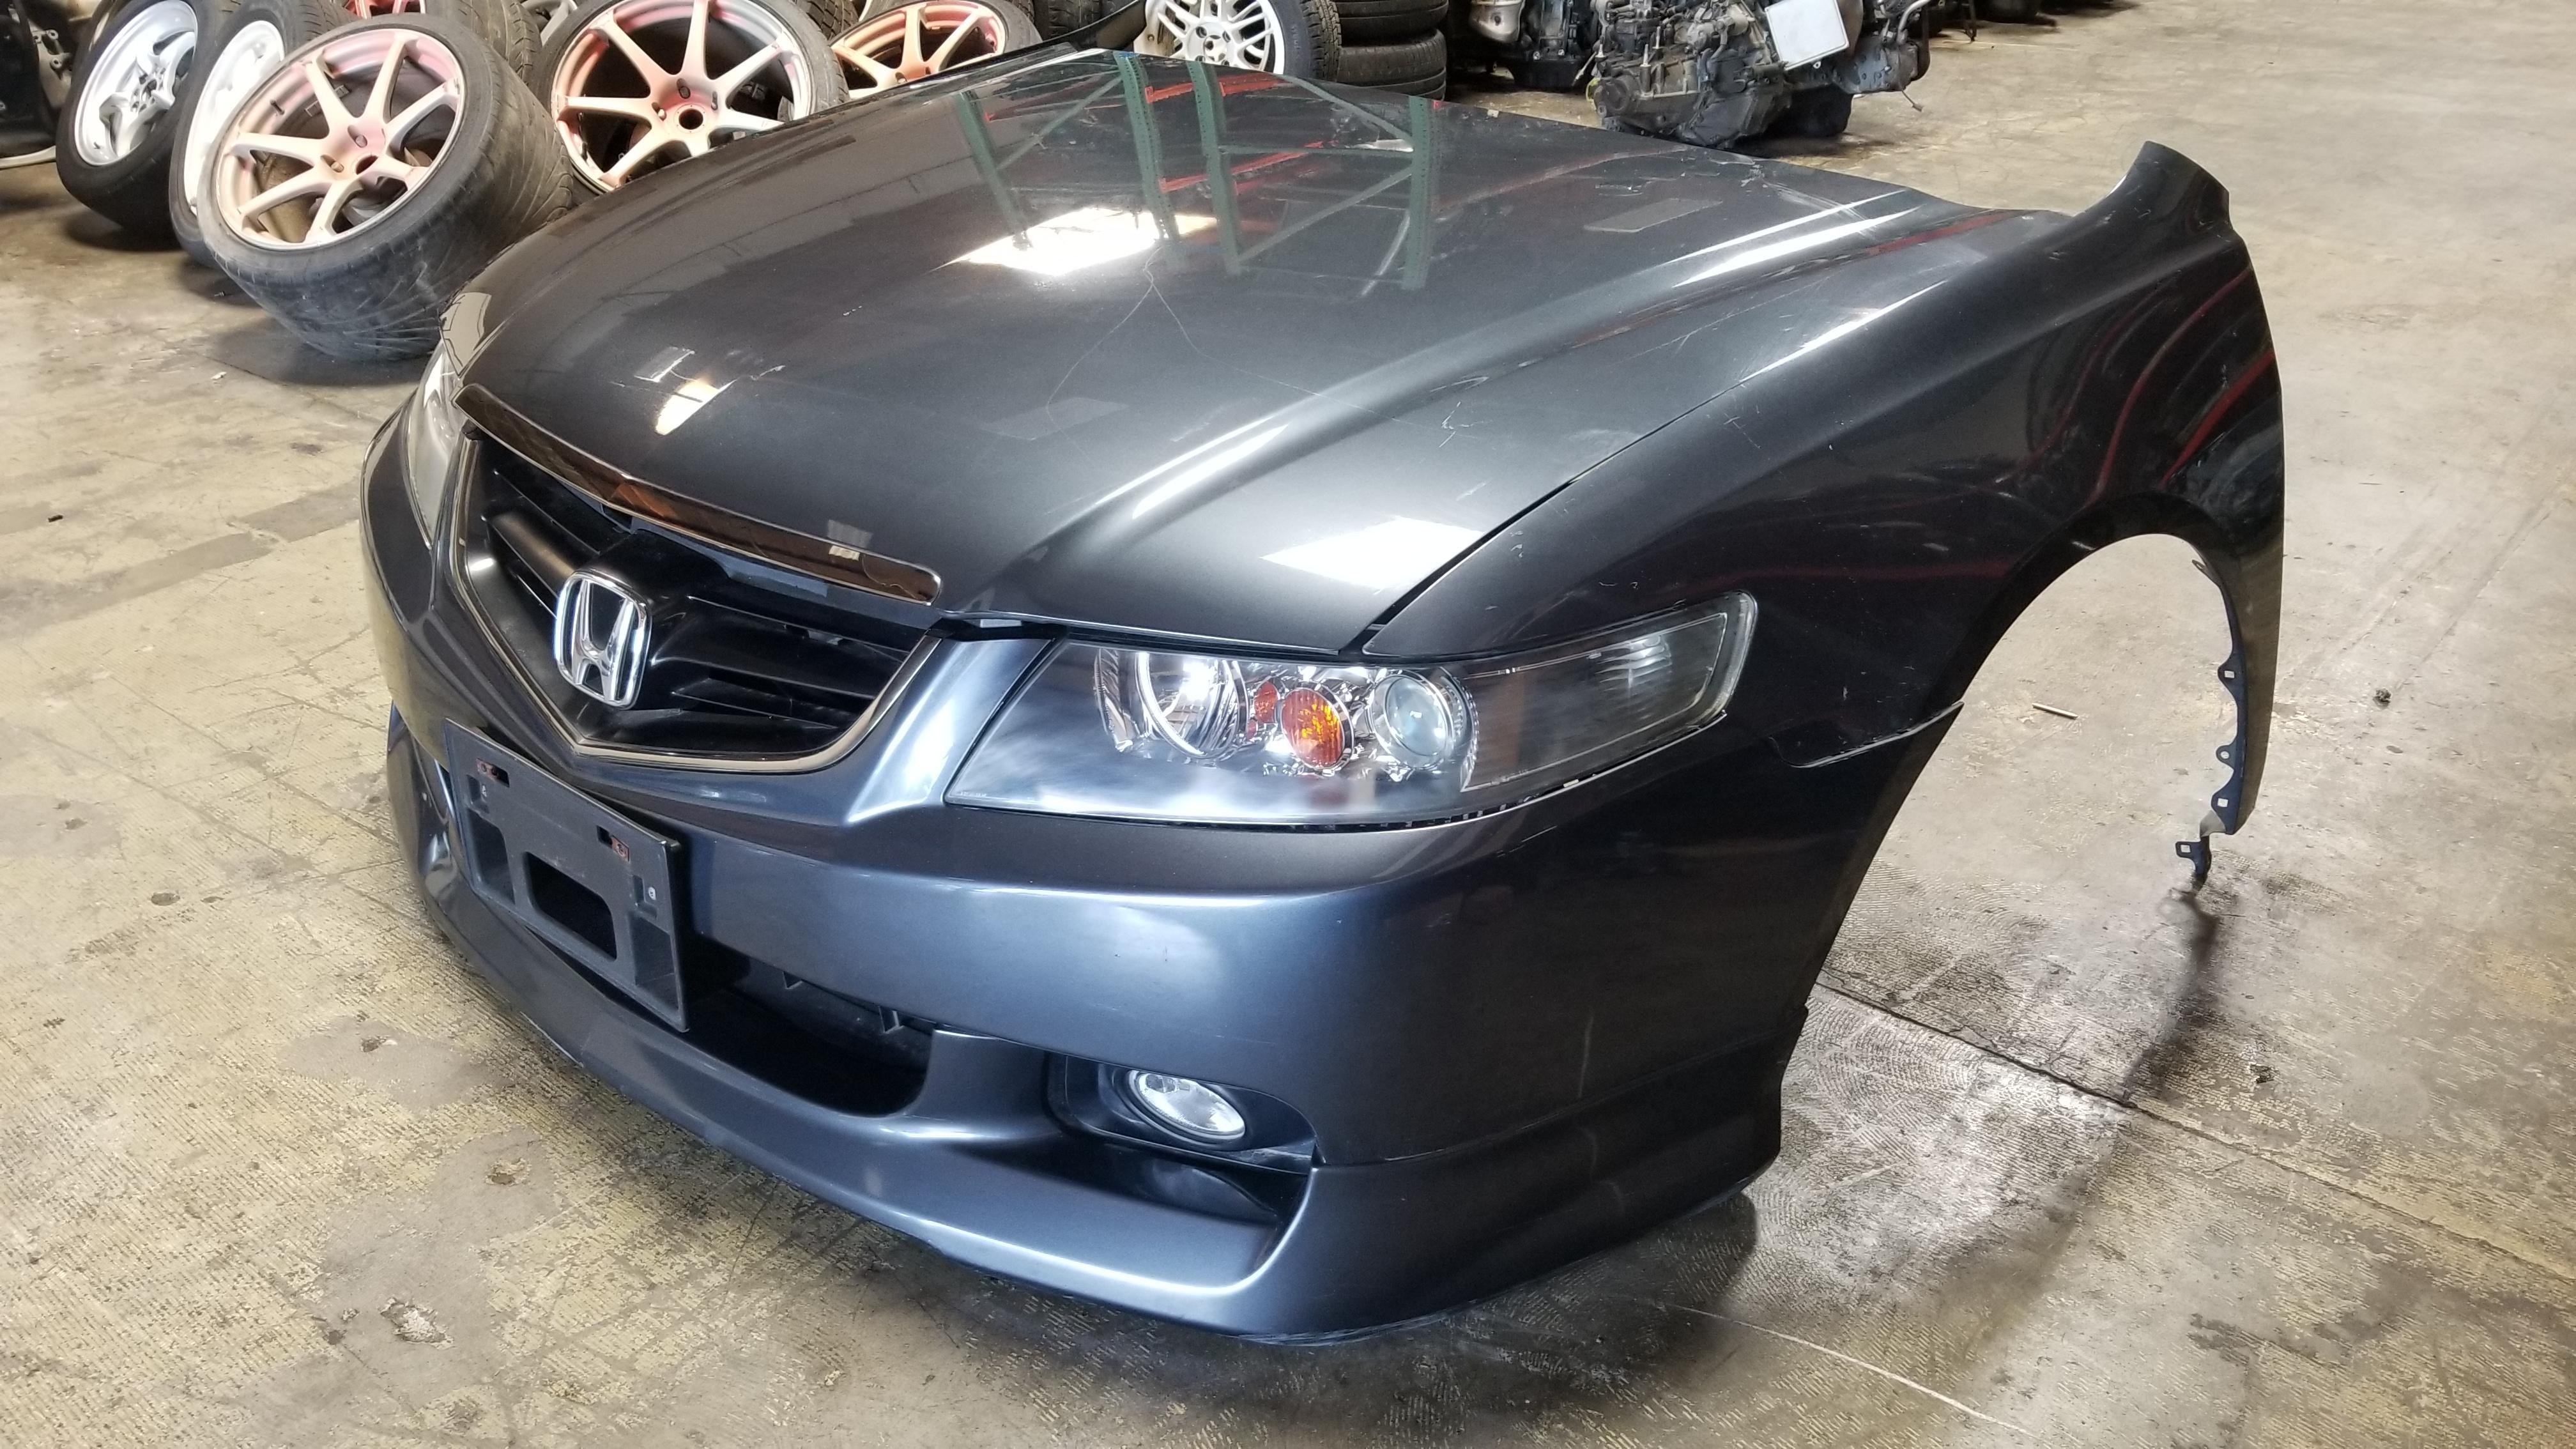 Nissan Chula Vista >> TSX 2004-2007 ACURA TSX JDM FRONT END CONVERSION NOSE CUT CL7 HONDA ACCORD GREY 4DR | JDM Of San ...